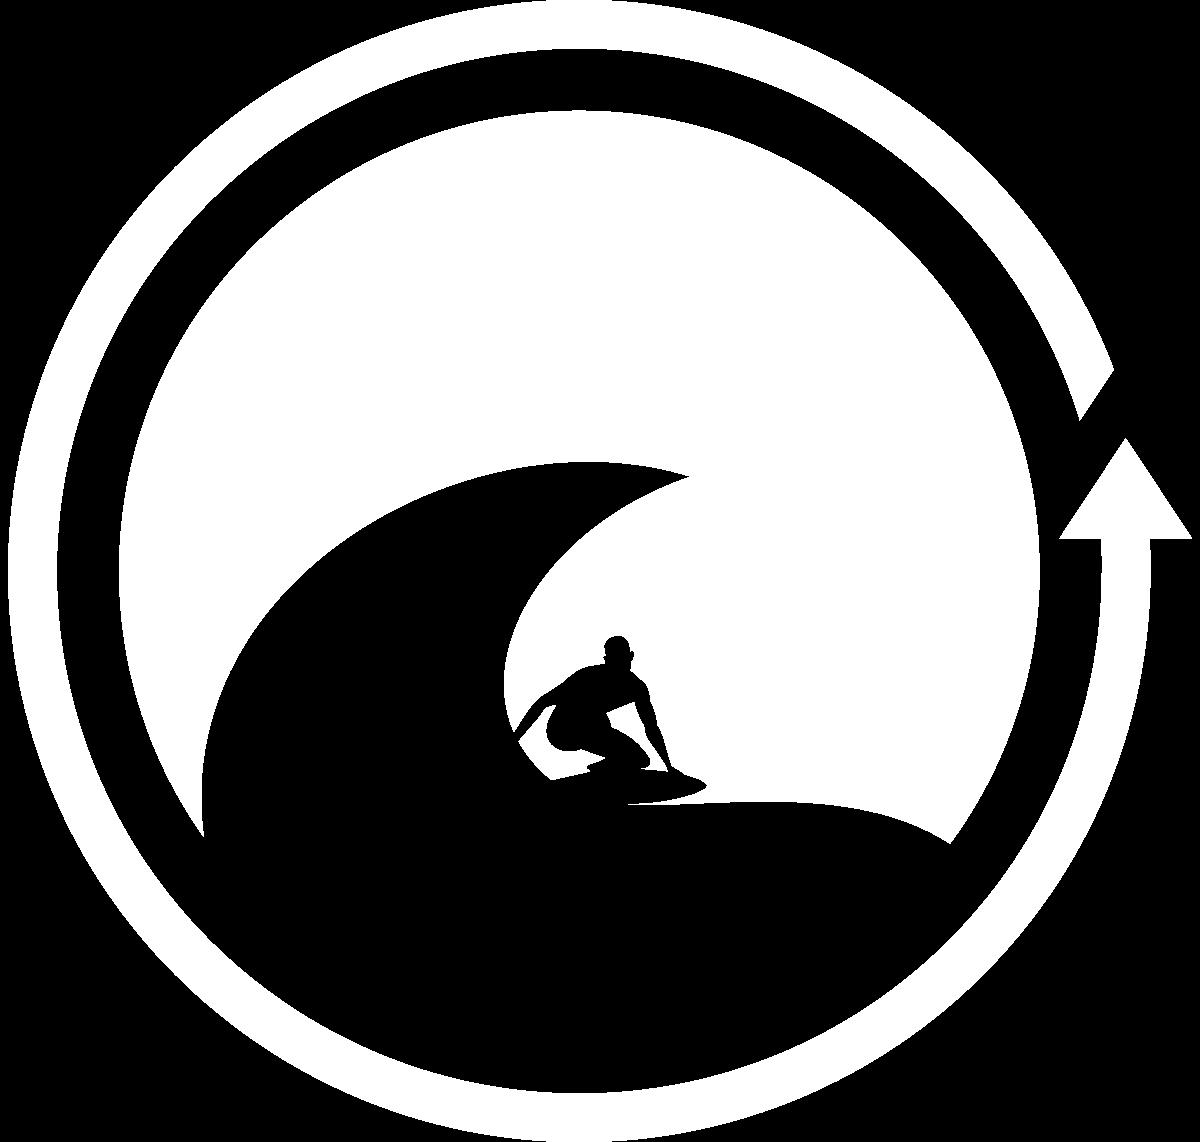 surf-symbol-bg-1200-lighten